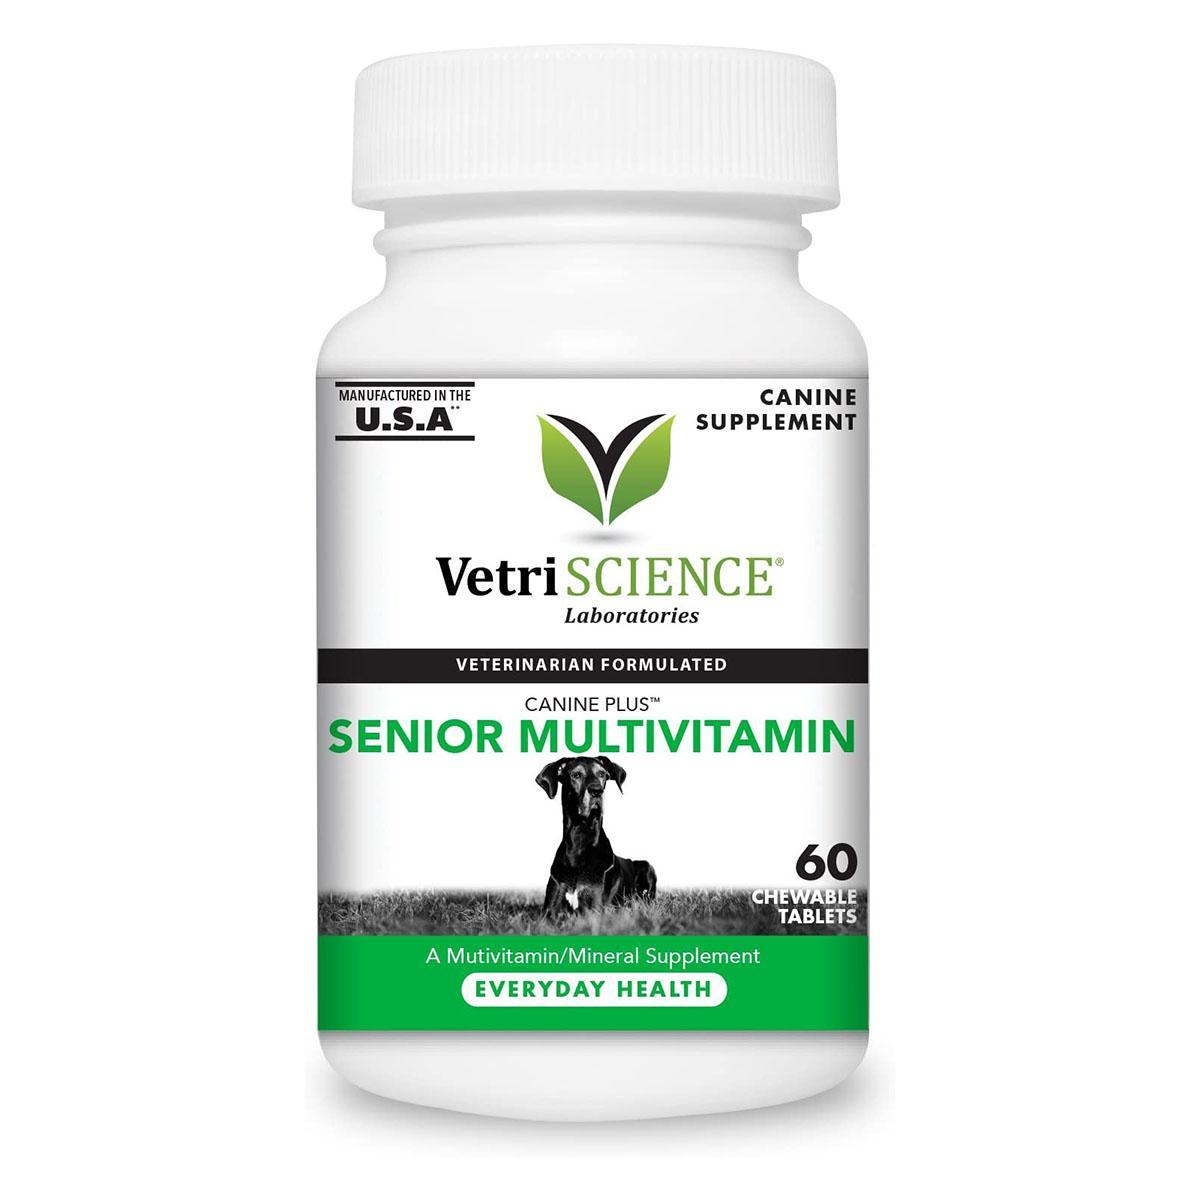 VetriScience Canine Plus Senior Multivitamin Dog Chewable Tablets